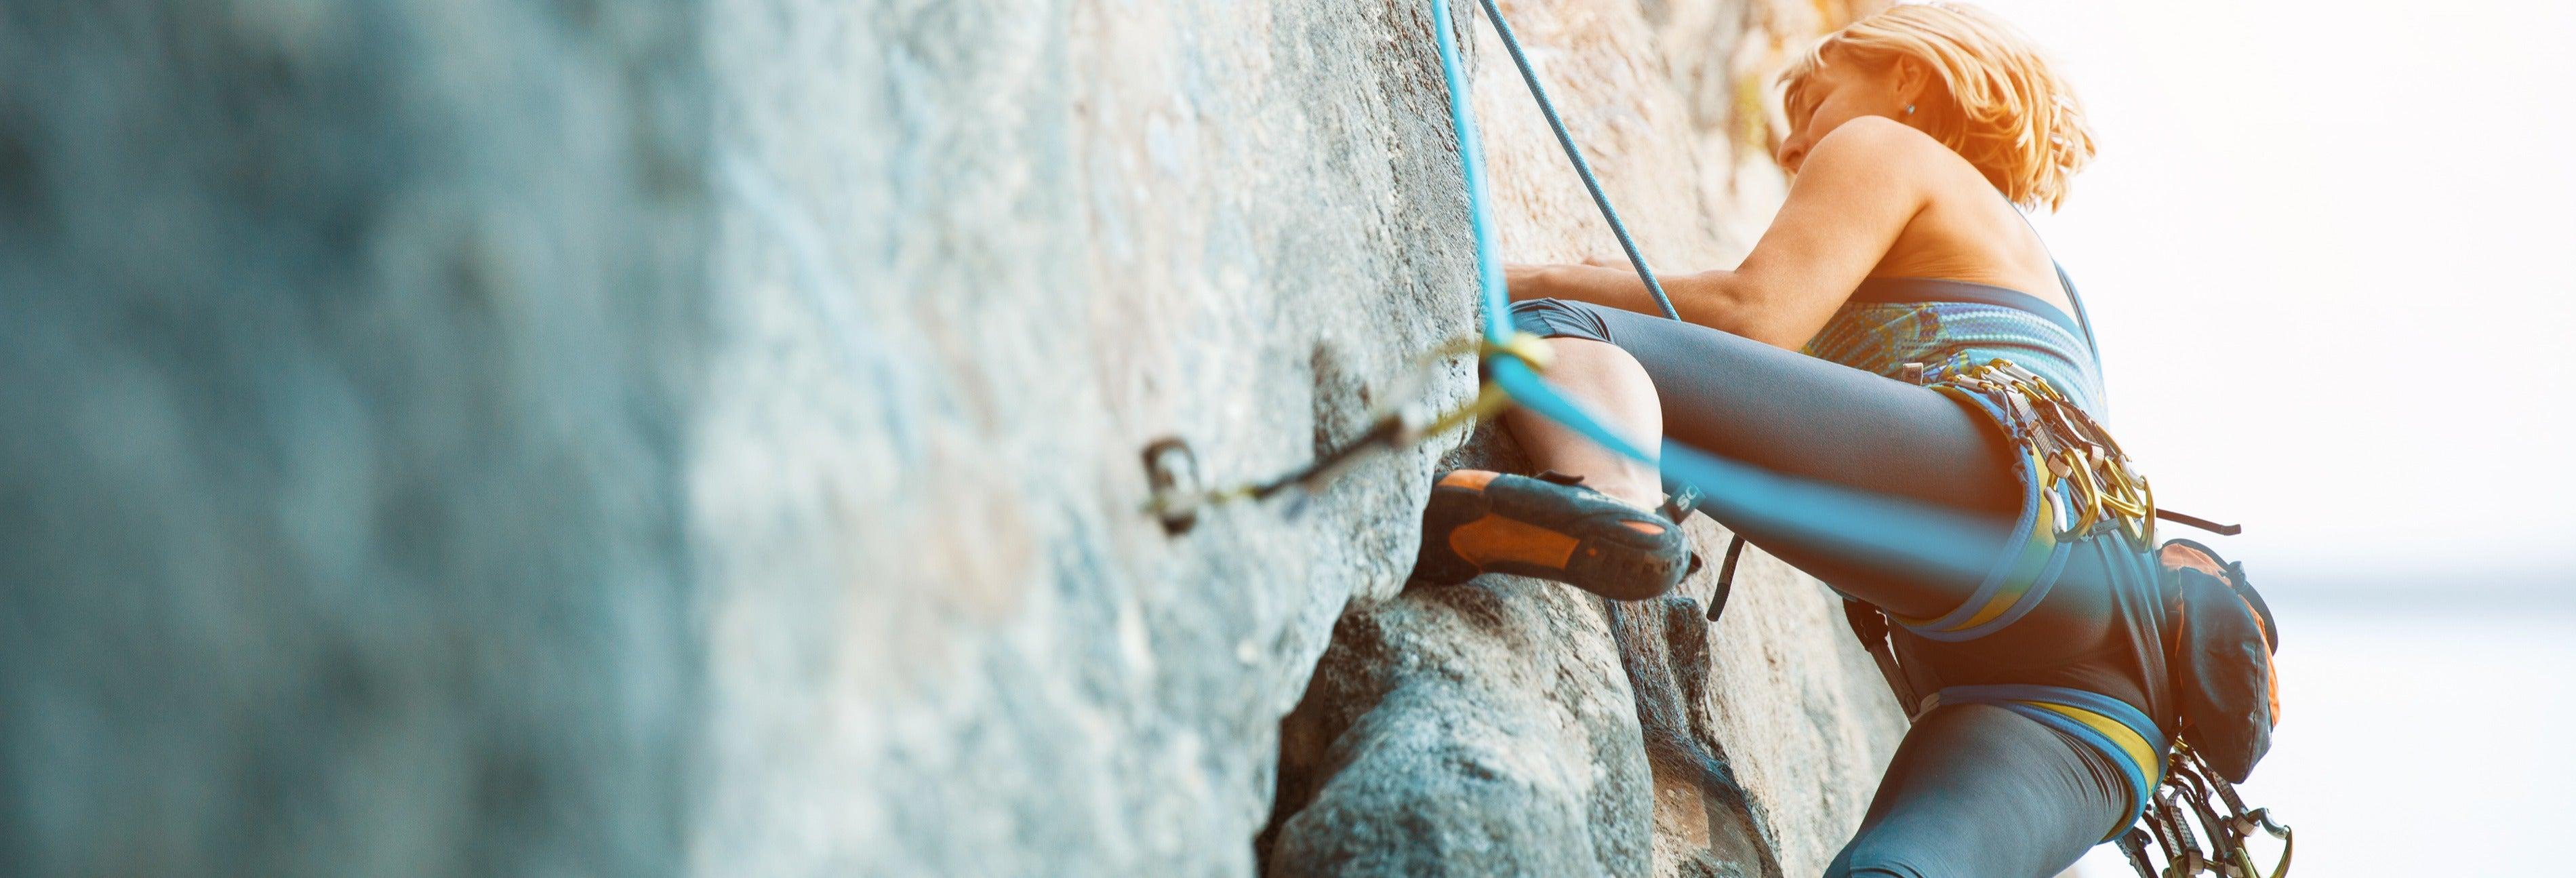 Escalade dans la Vallée Sacrée des Incas